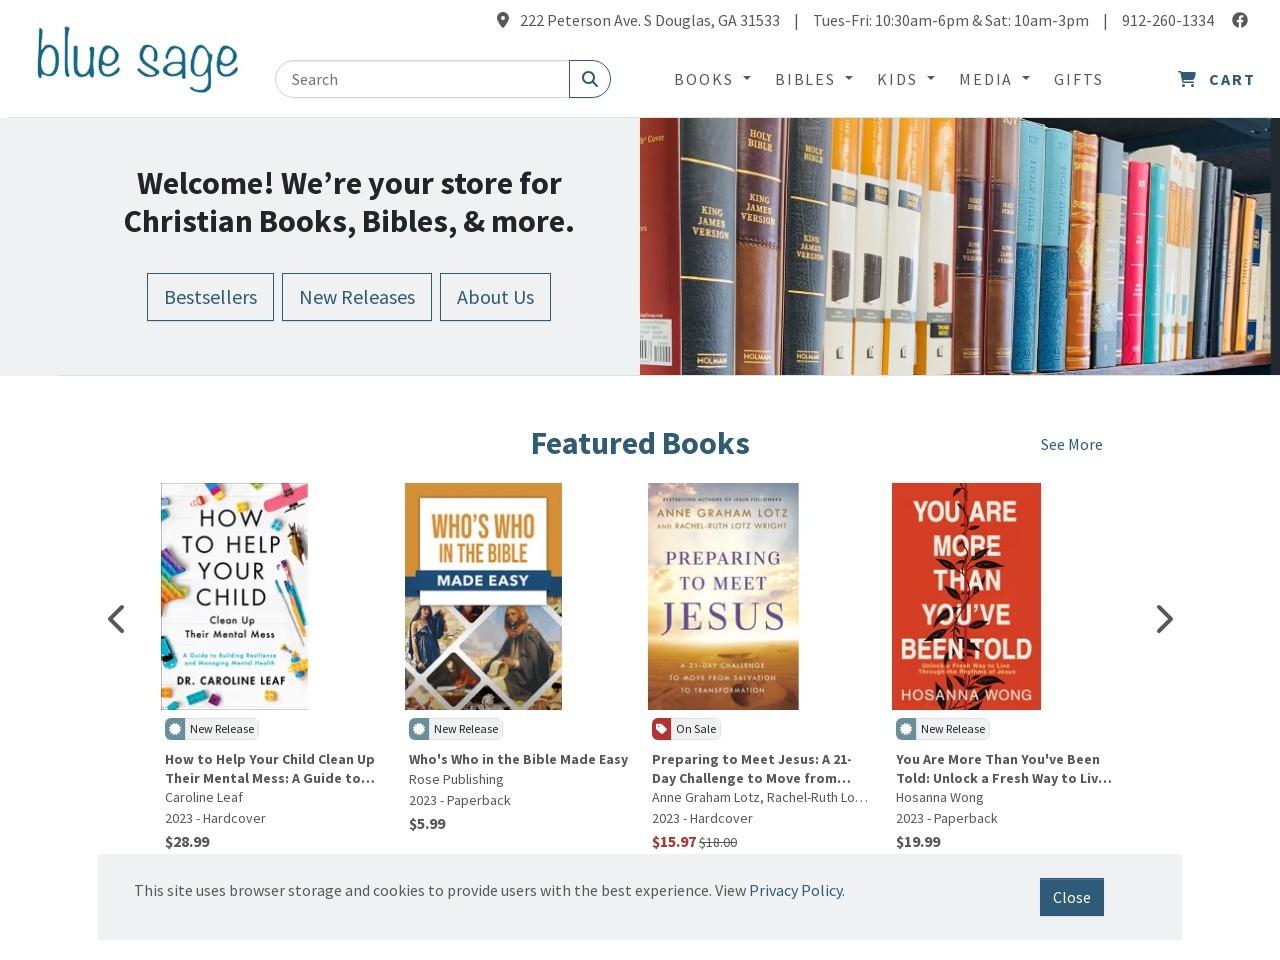 shopbluesage.com